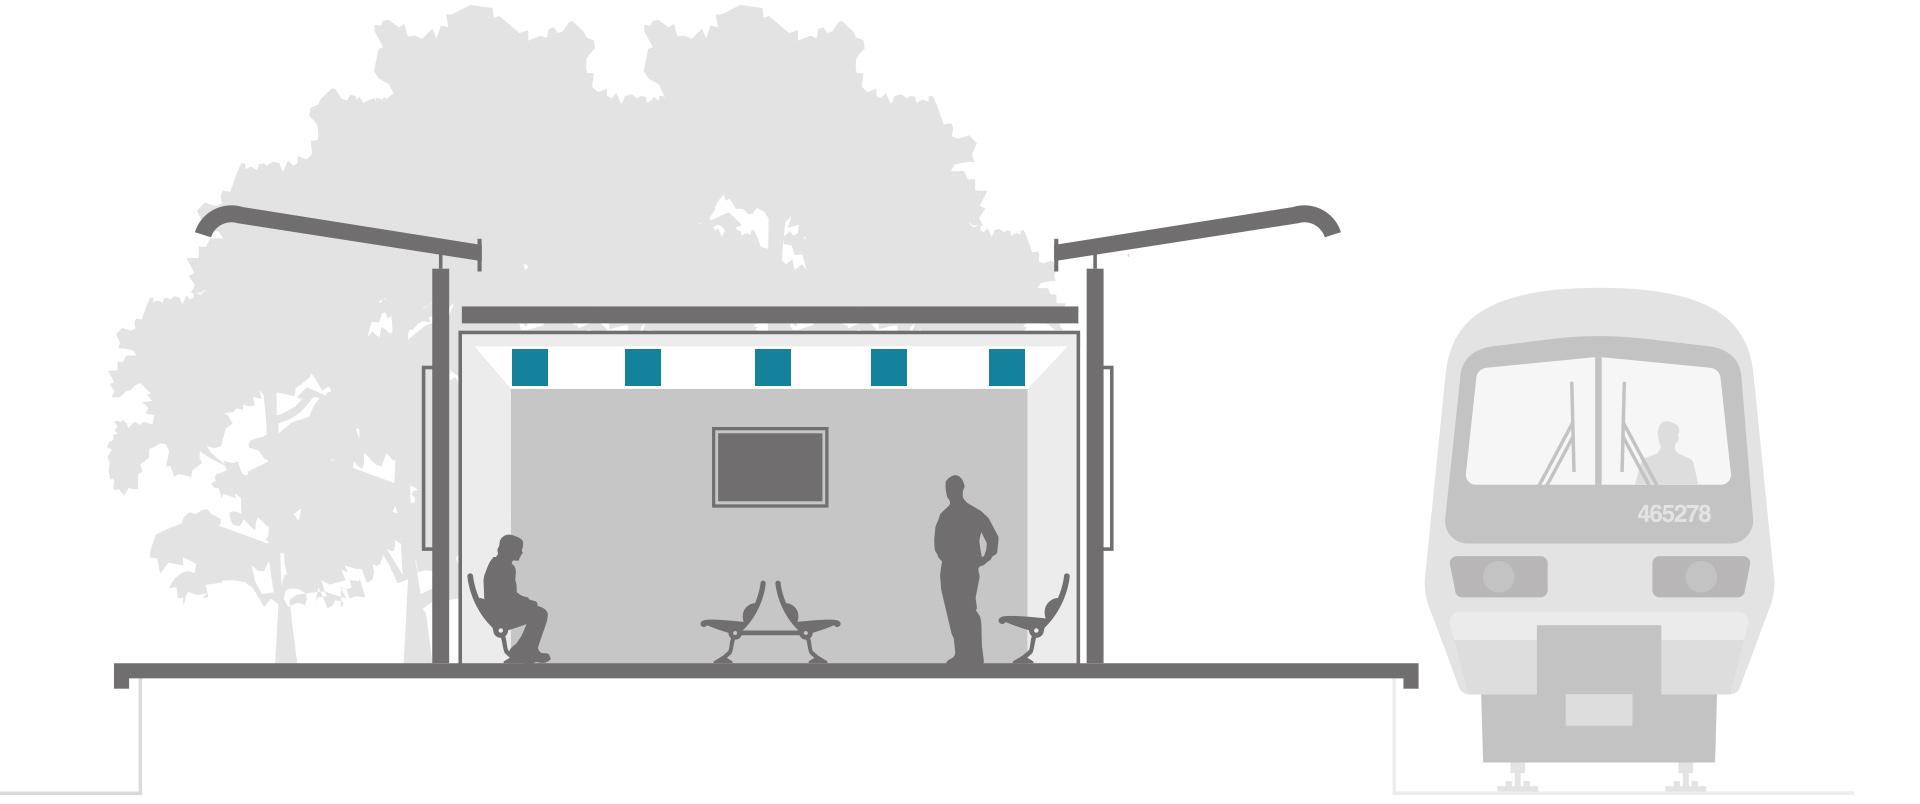 Transportapplications_waiting_room